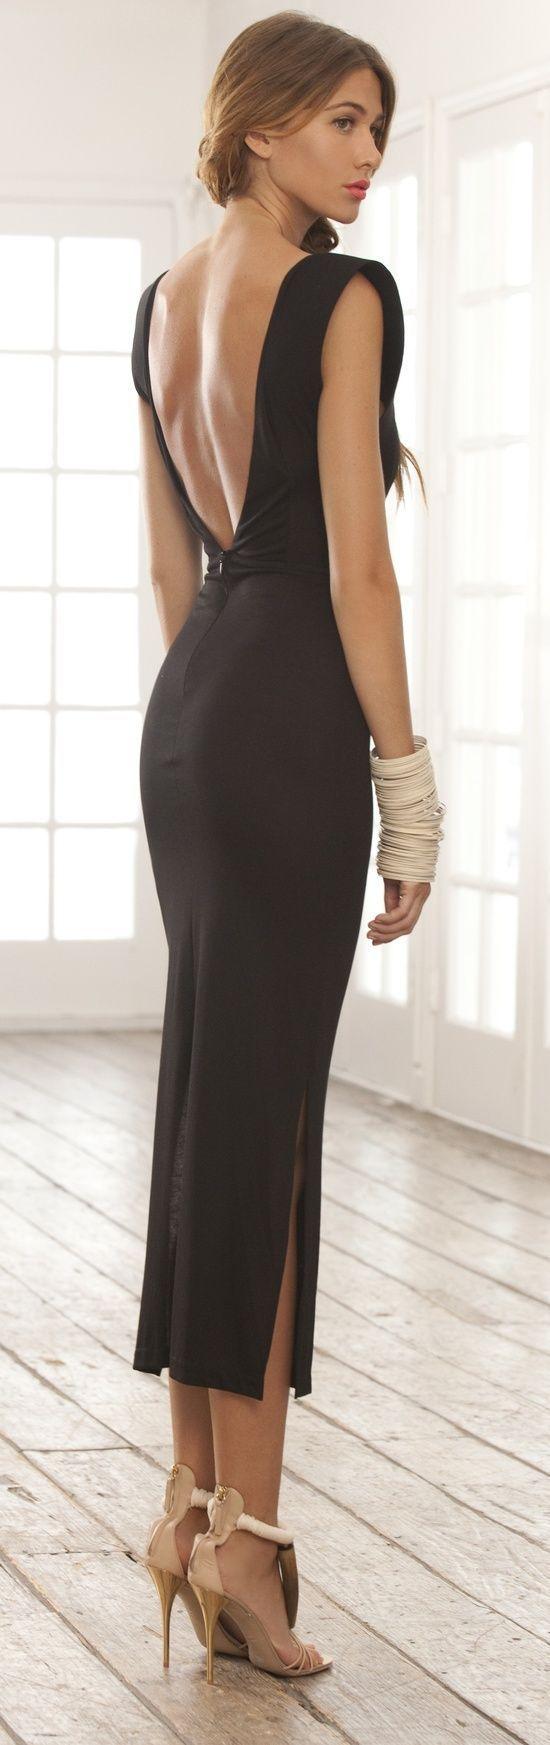 elegant black cocktail dress